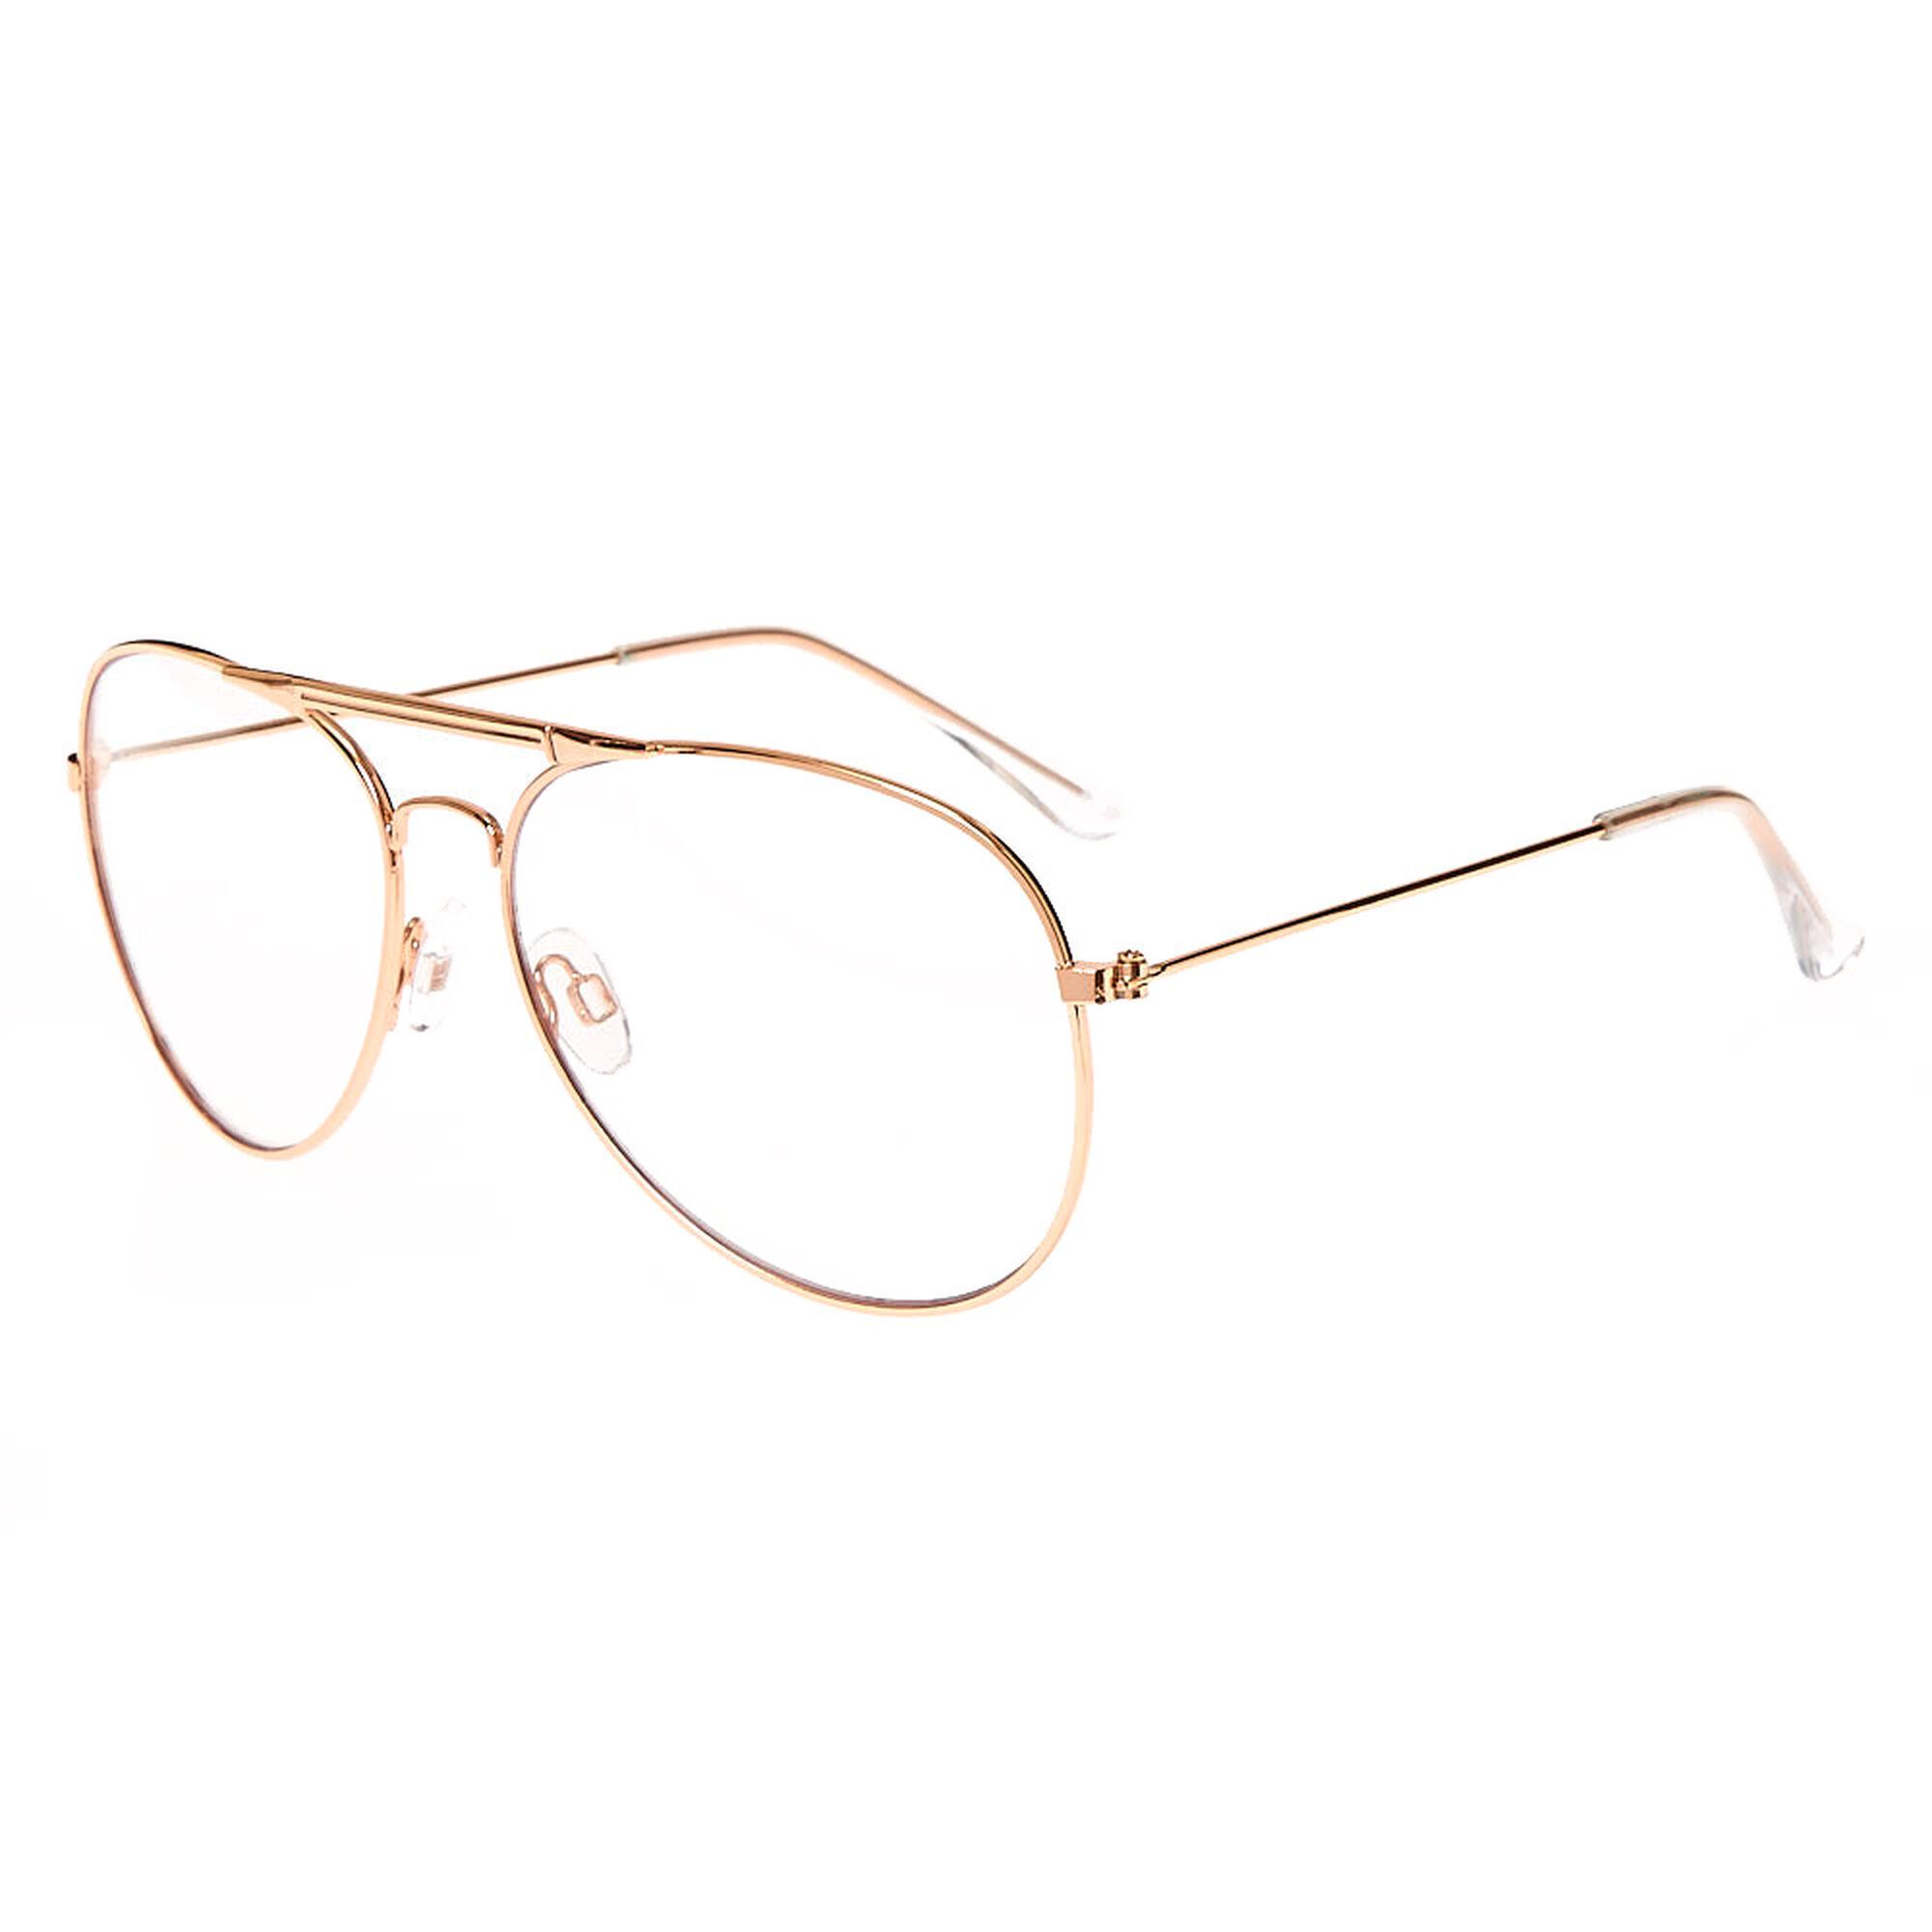 8b99d176b Rose Gold Metal Aviator Frames | Claire's